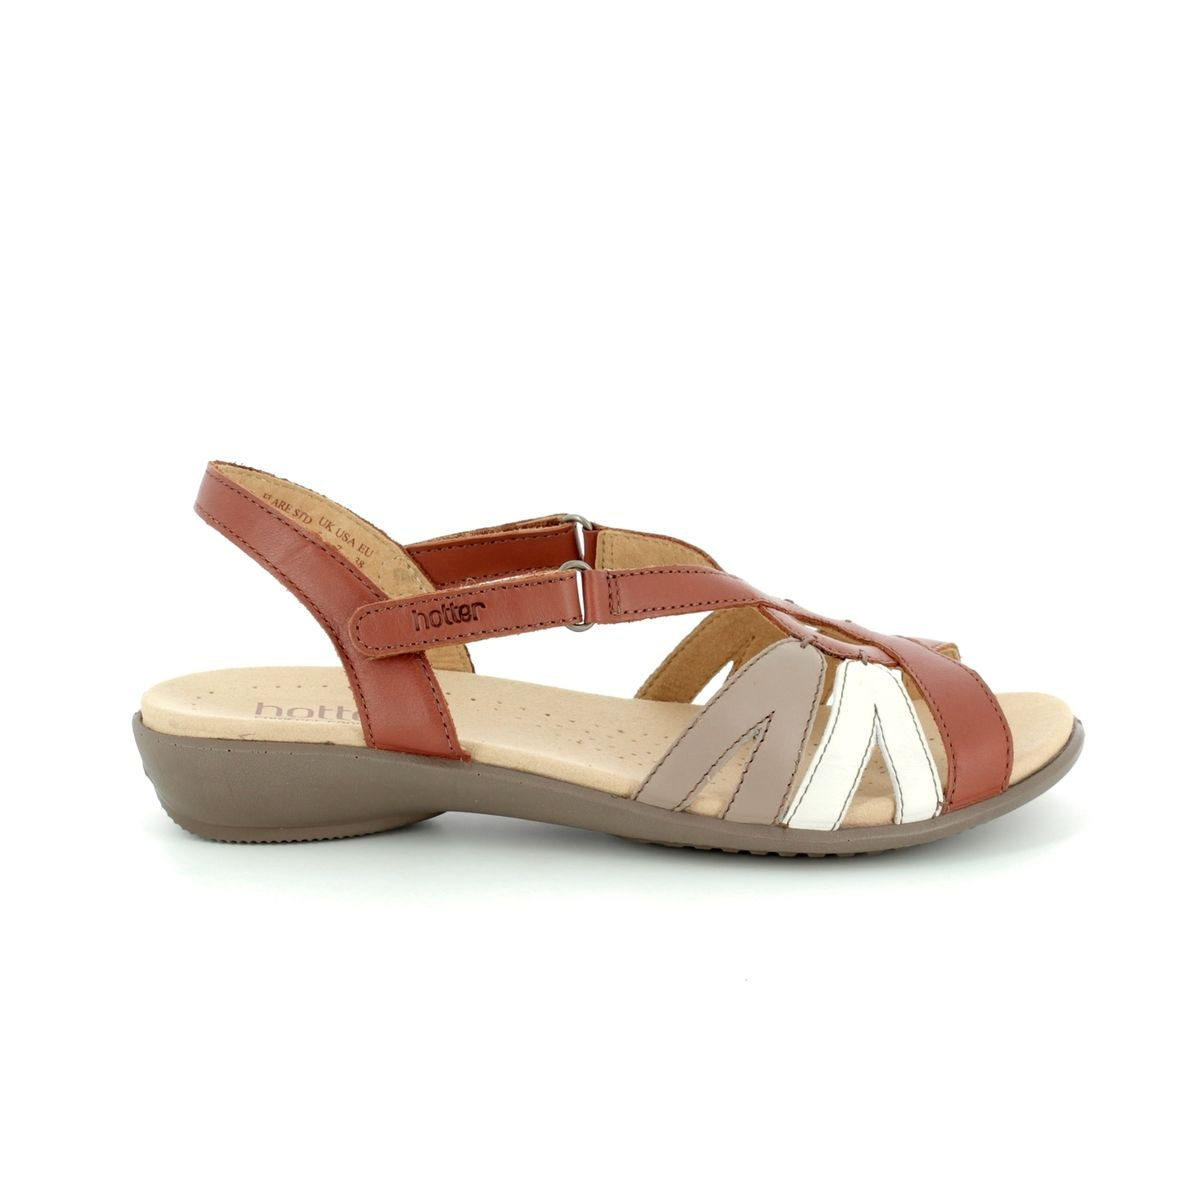 Hotter Sandals Tan Multi 8107 11 Flare E Fit